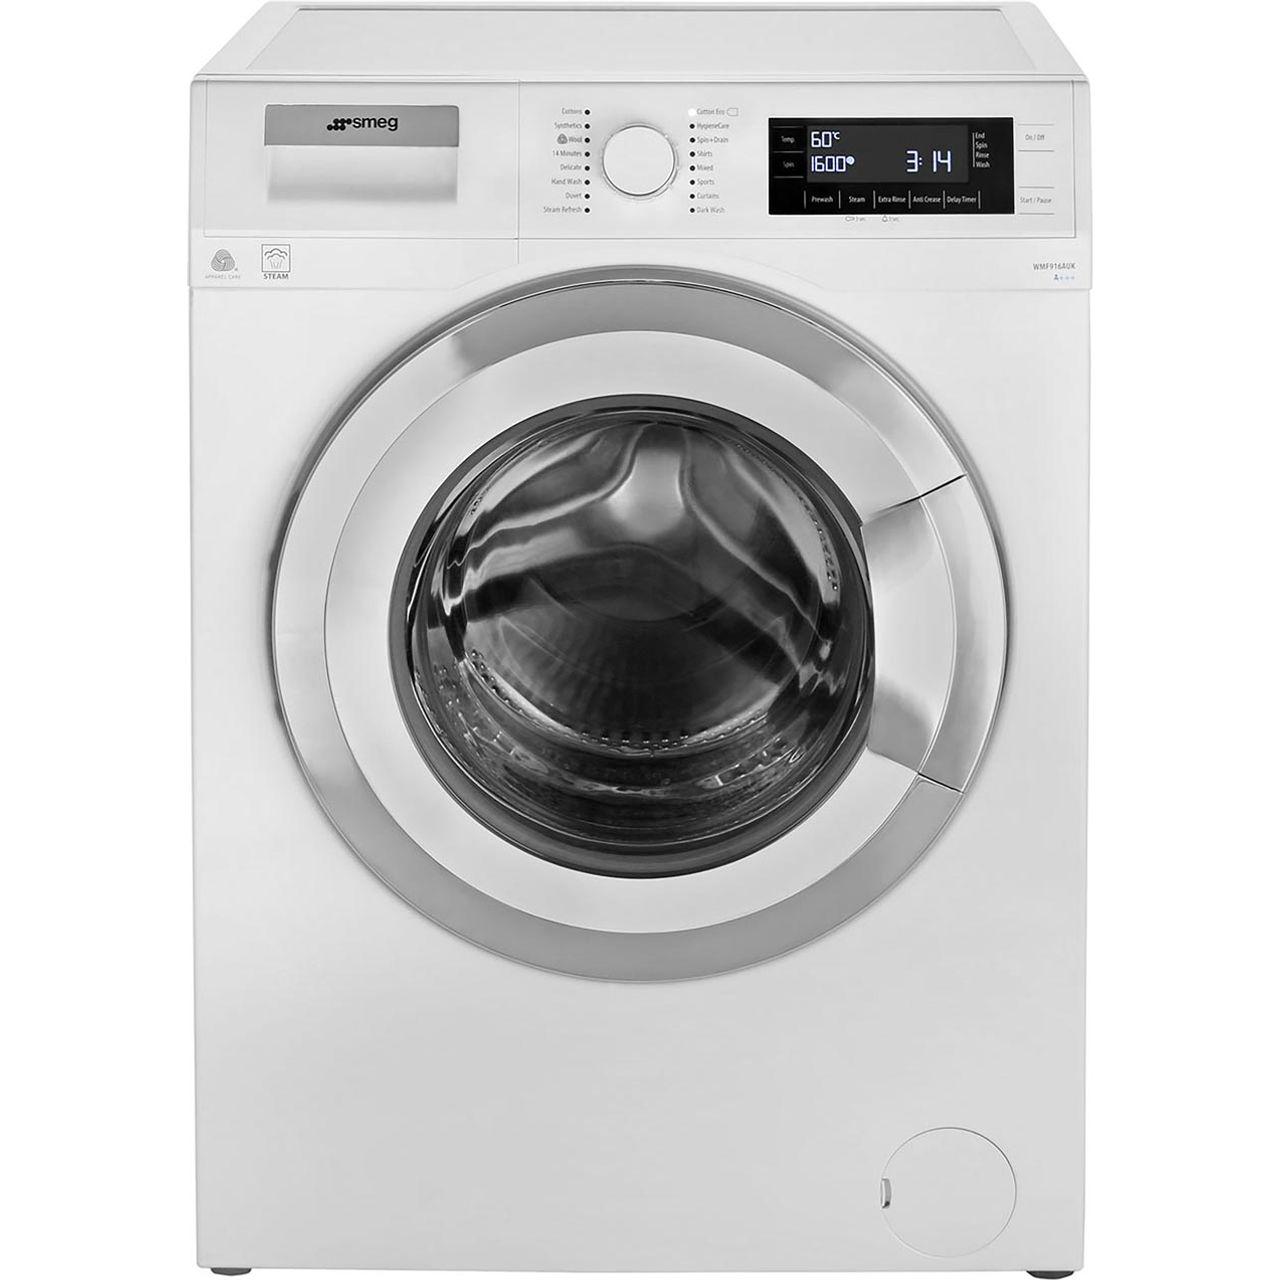 Smeg WMF916AUK 9Kg Washing Machine with 1600 rpm - White / Chrome - A+++ Rated £399 @ AO